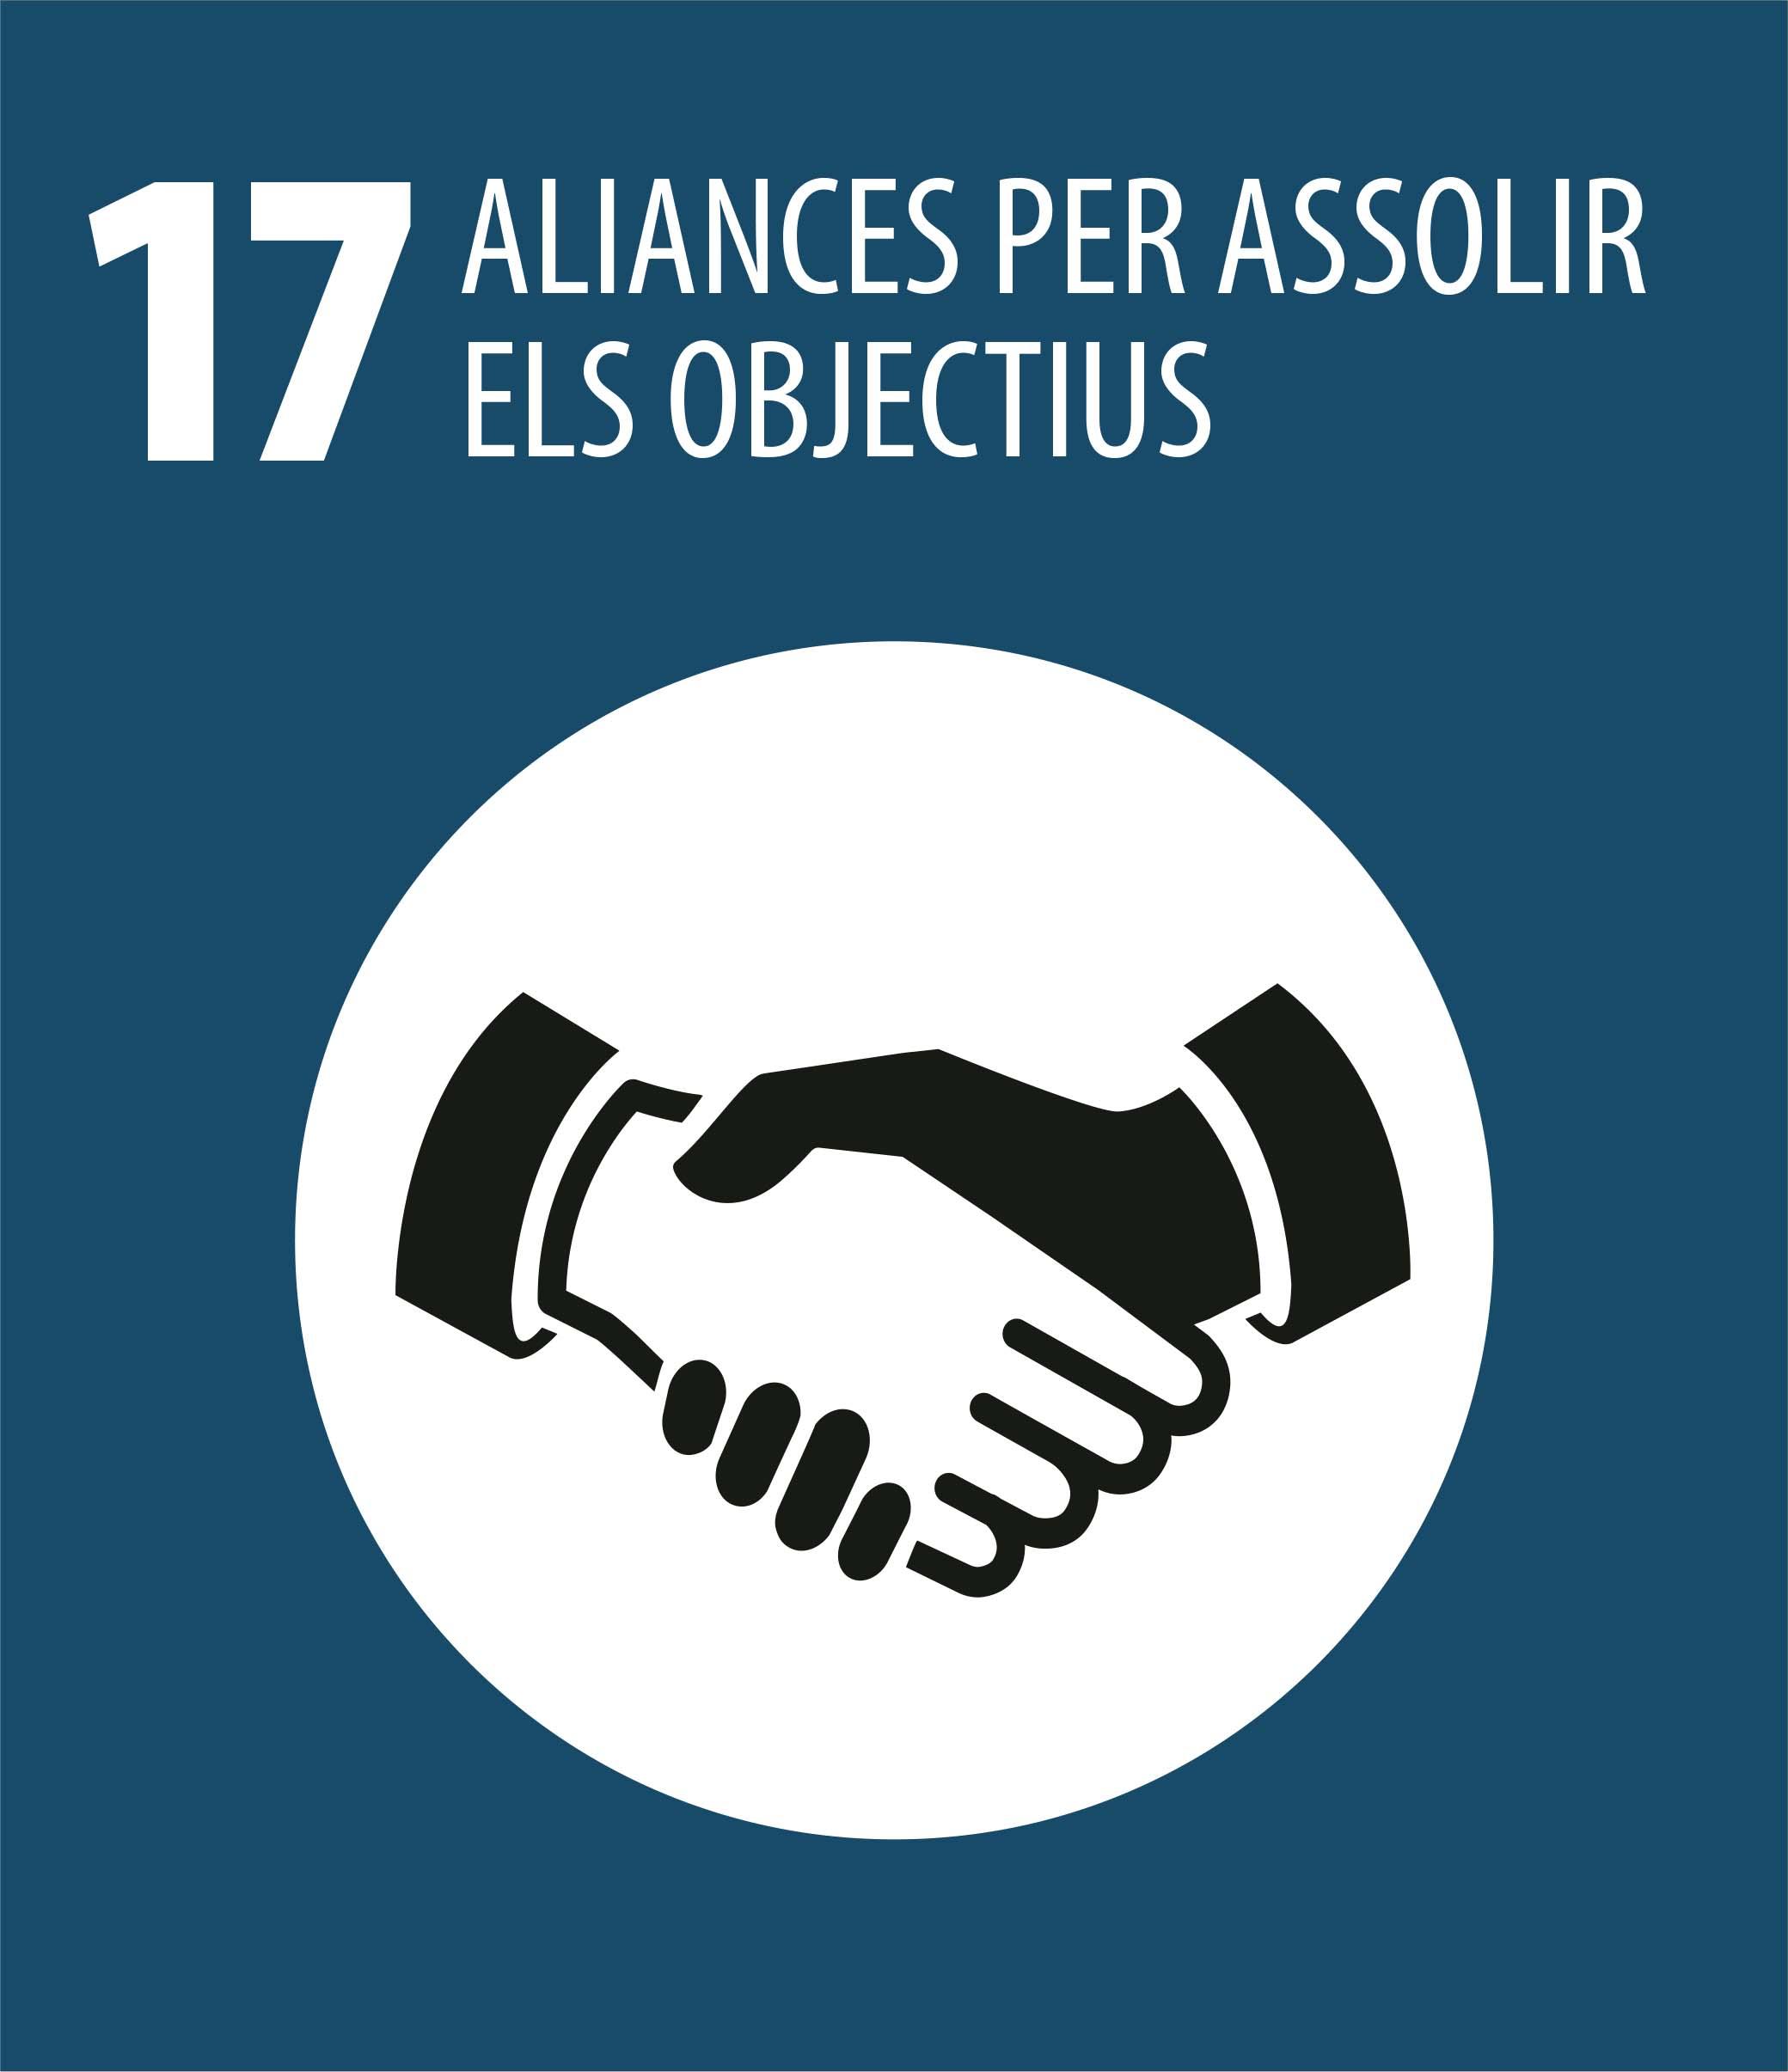 ODS 17 Aliances per assolir objectius